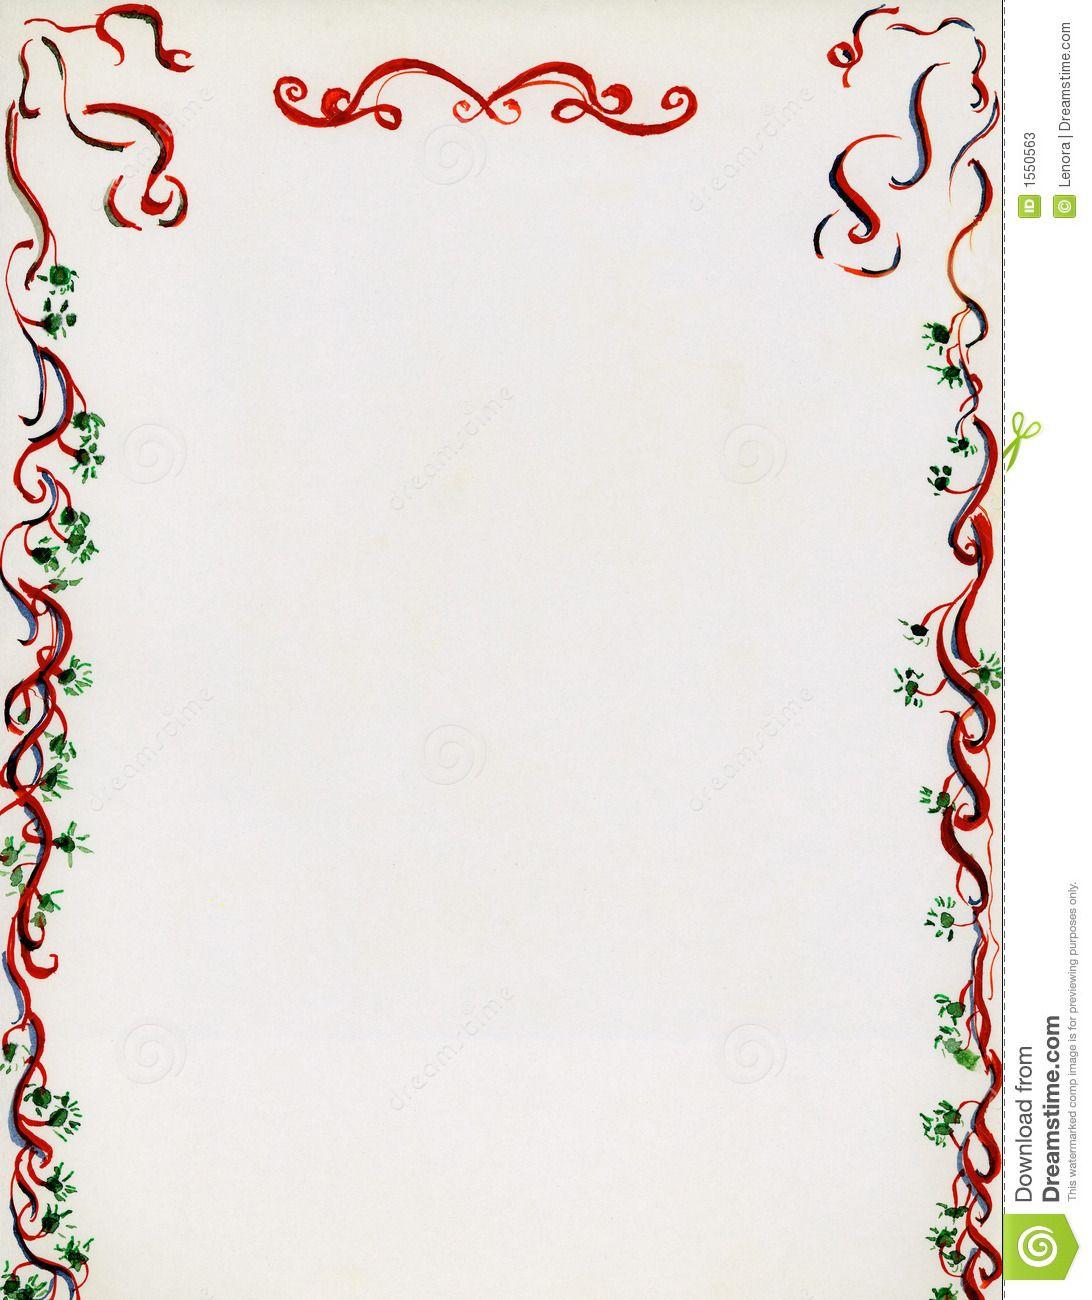 christmas letterhead templates for word – Christmas Template for Word